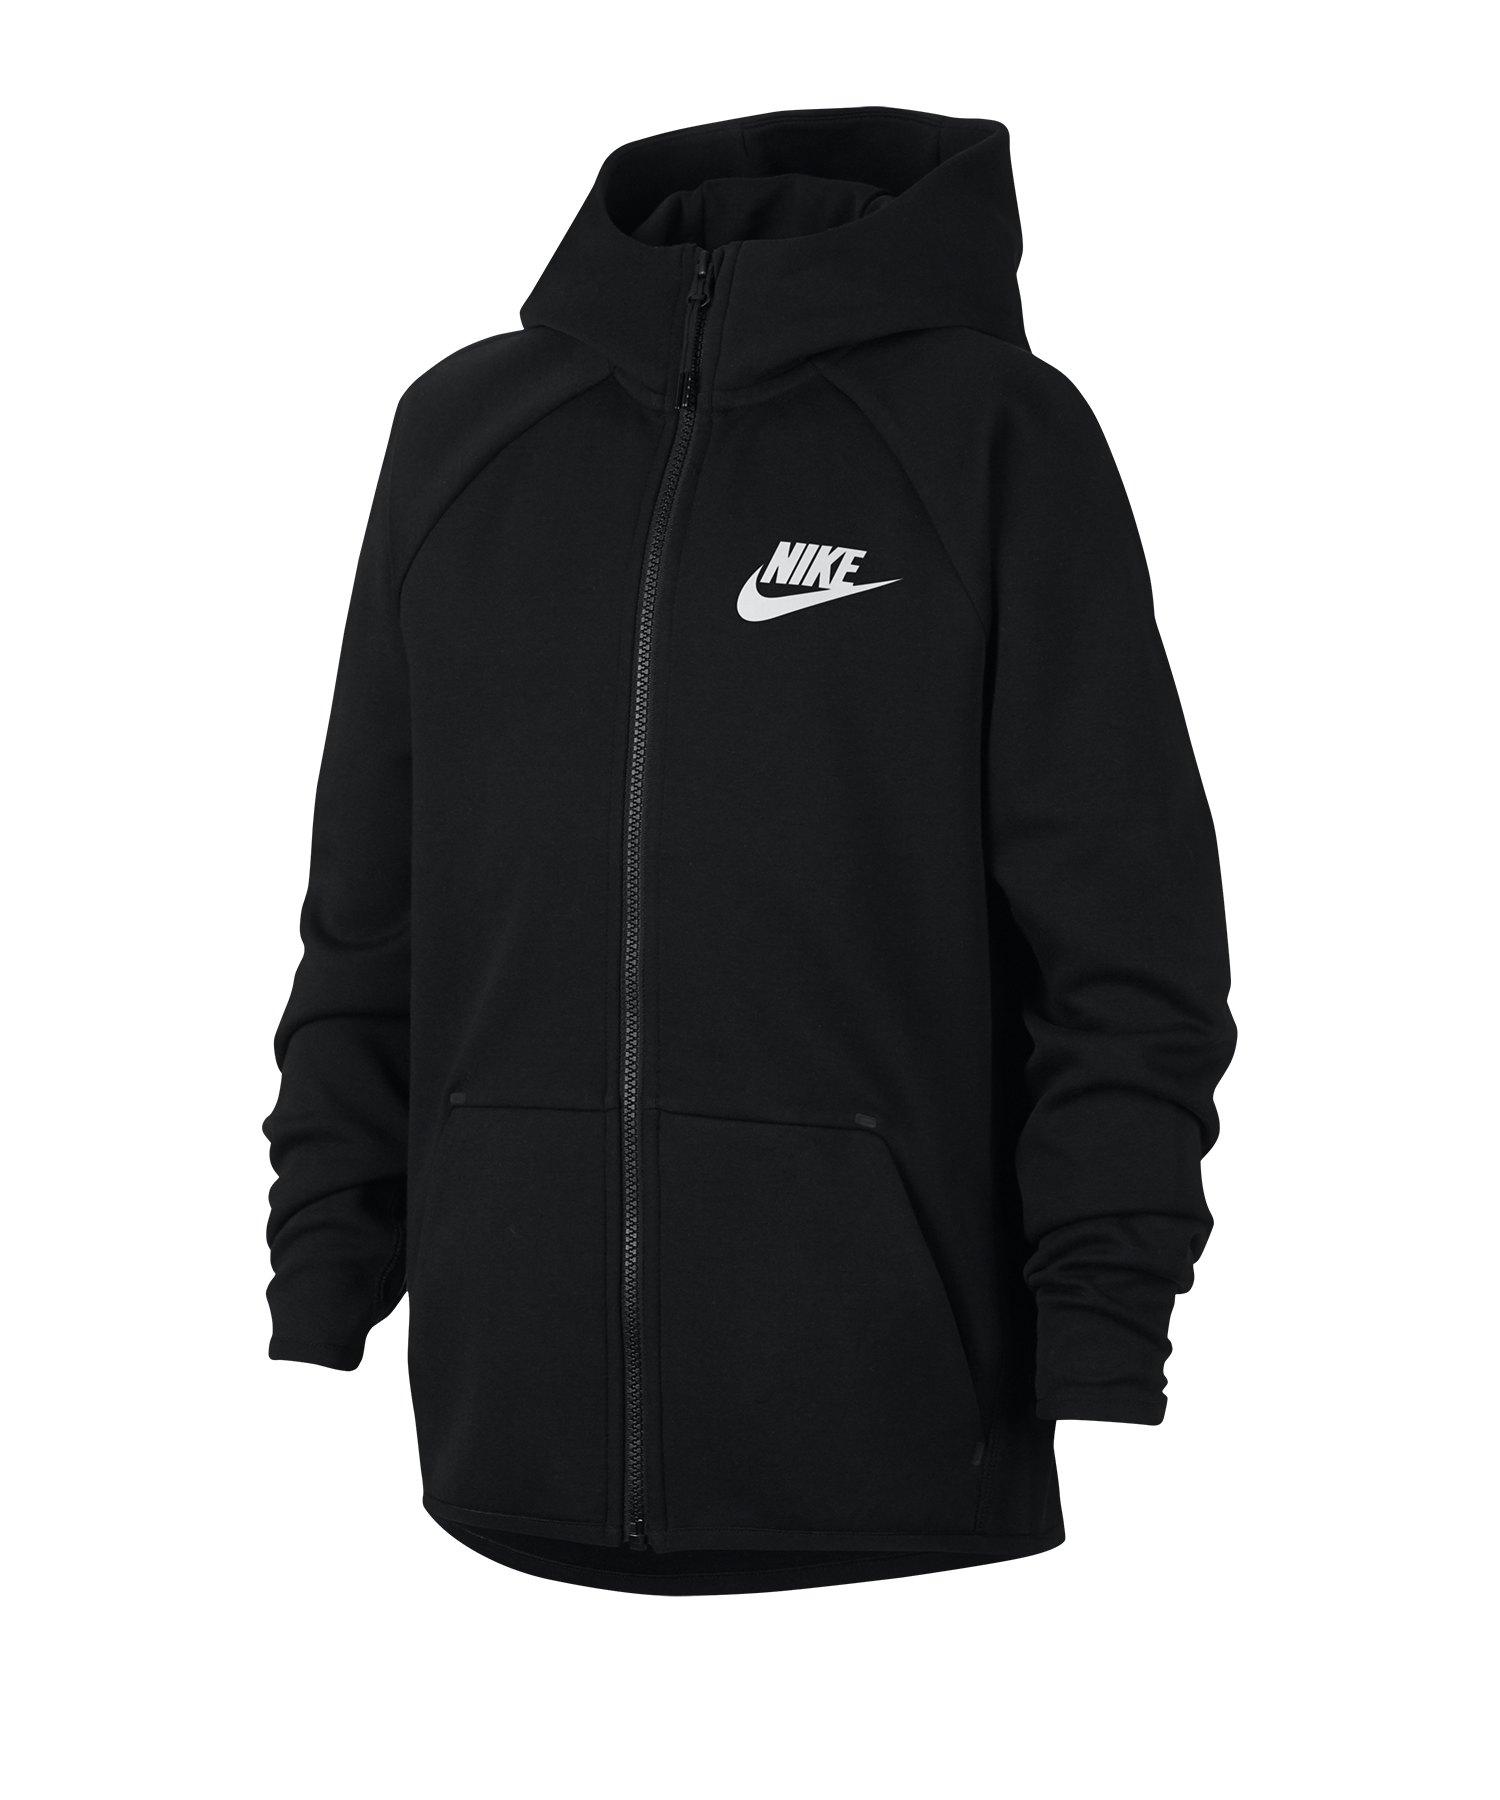 Nike Tech Fleece Kapuzenjacke Jacket Kids F010 - schwarz